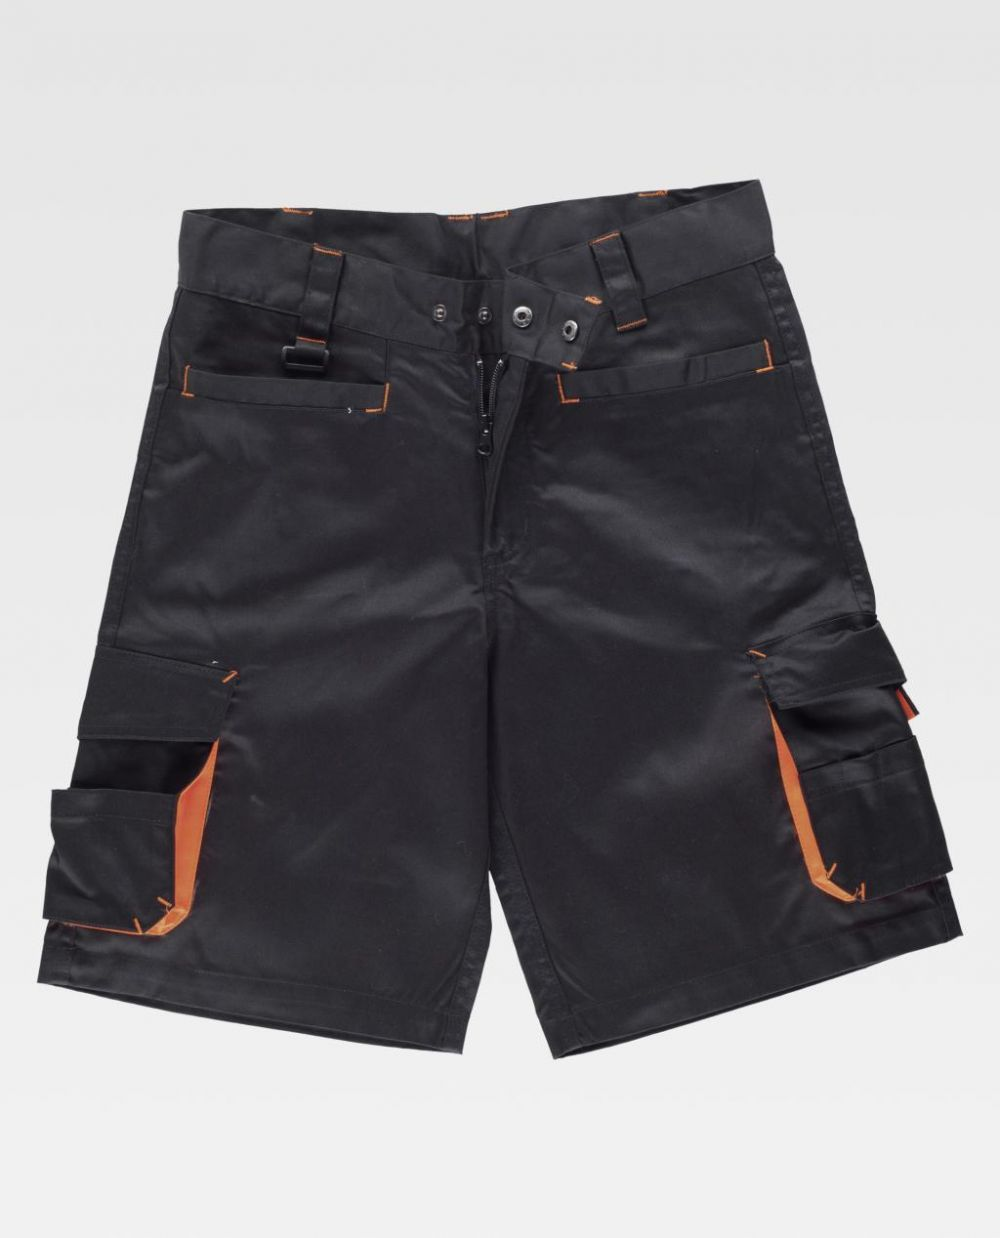 Pantalones reflectantes workteam bermuda combinada con detalles fluorescente de poliéster vista 1